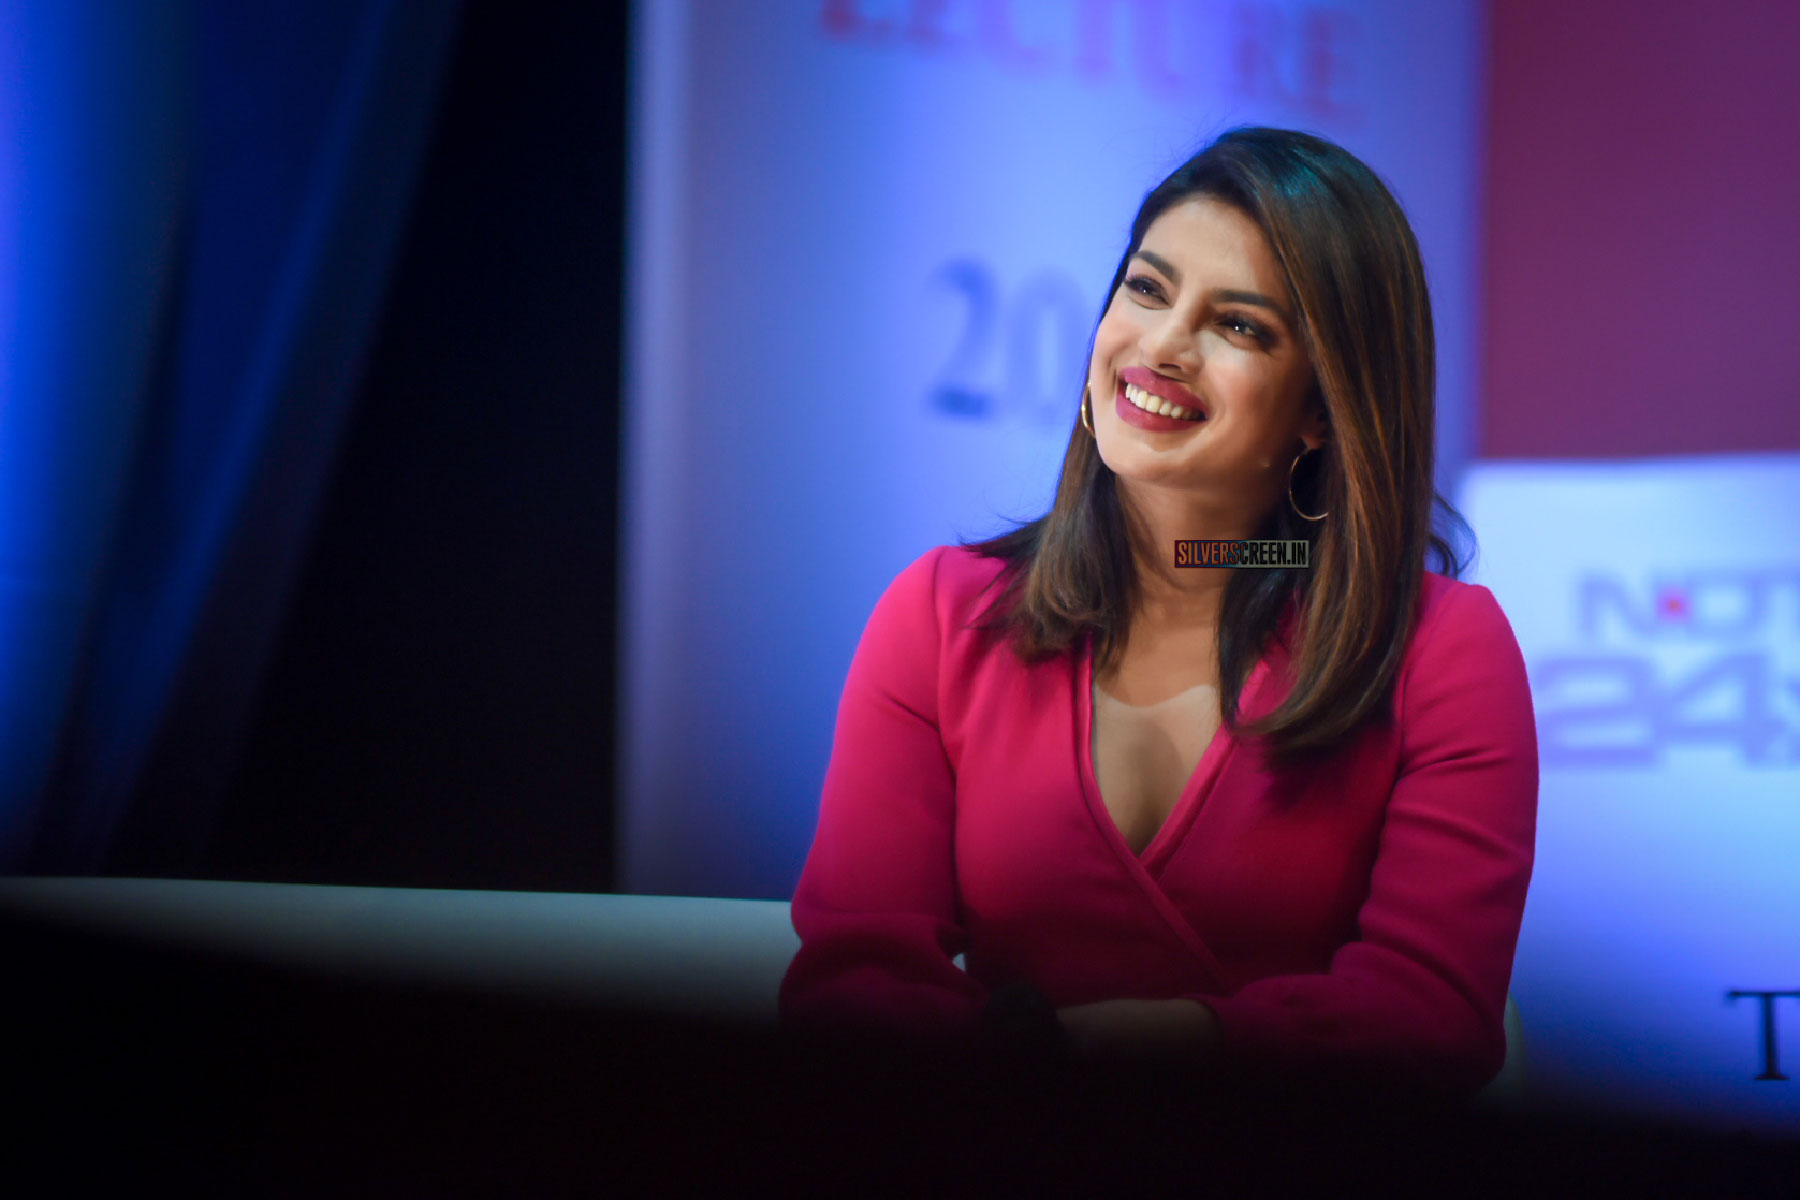 Priyanka Chopra At The Penguin Annual Lecture 2017